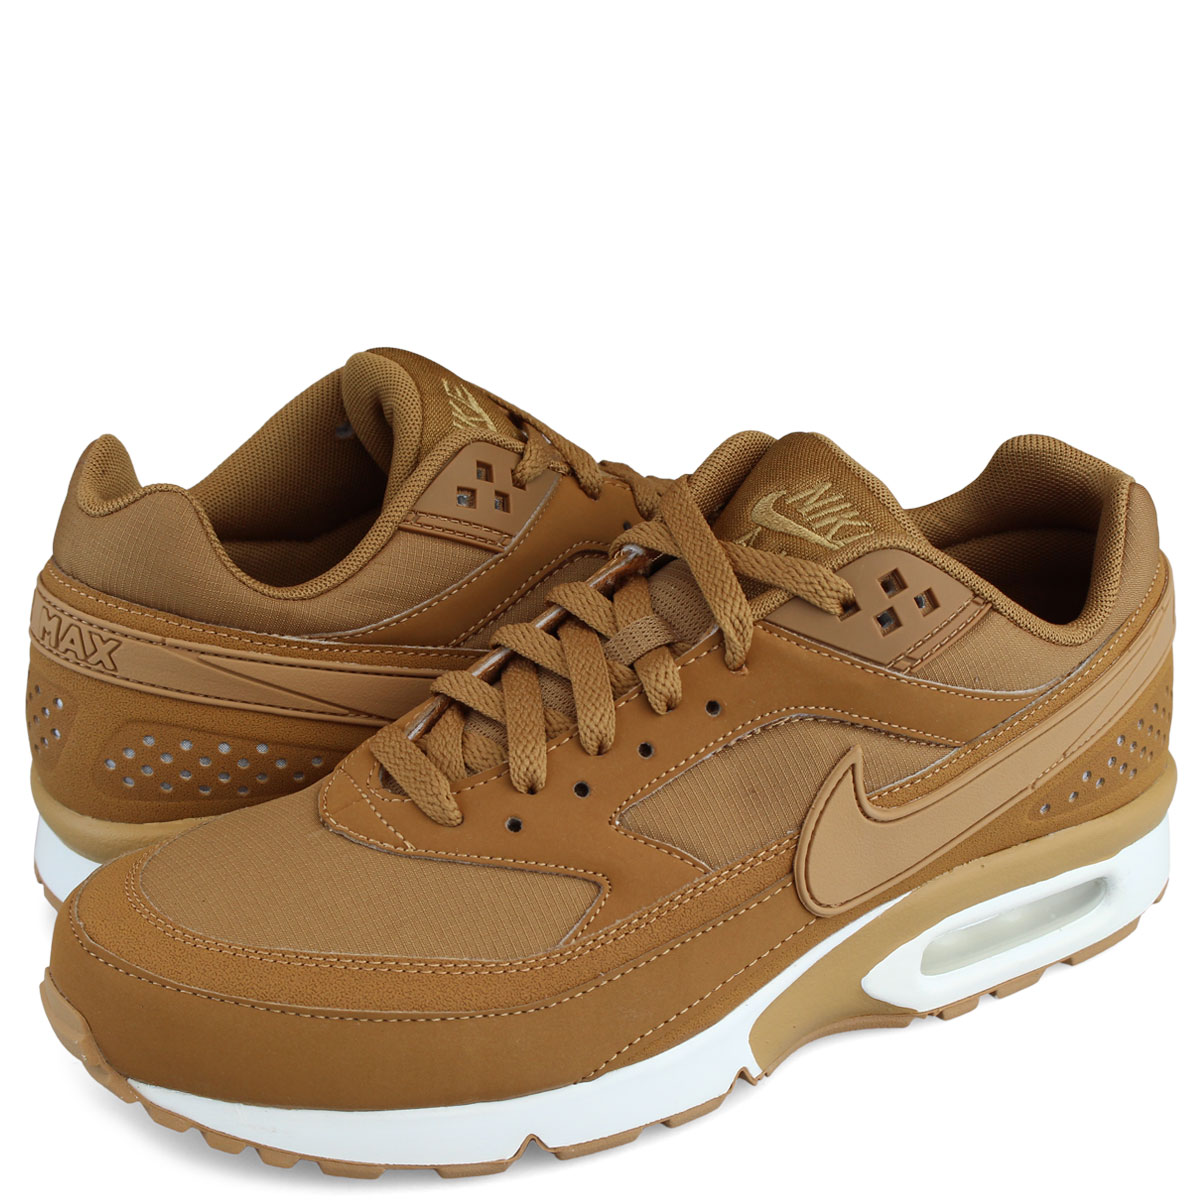 separation shoes 44ebb c91e4 NIKE AIR MAX BW Kie Ney AMAX sneakers 881,981-200 men s big window shoes  light ...